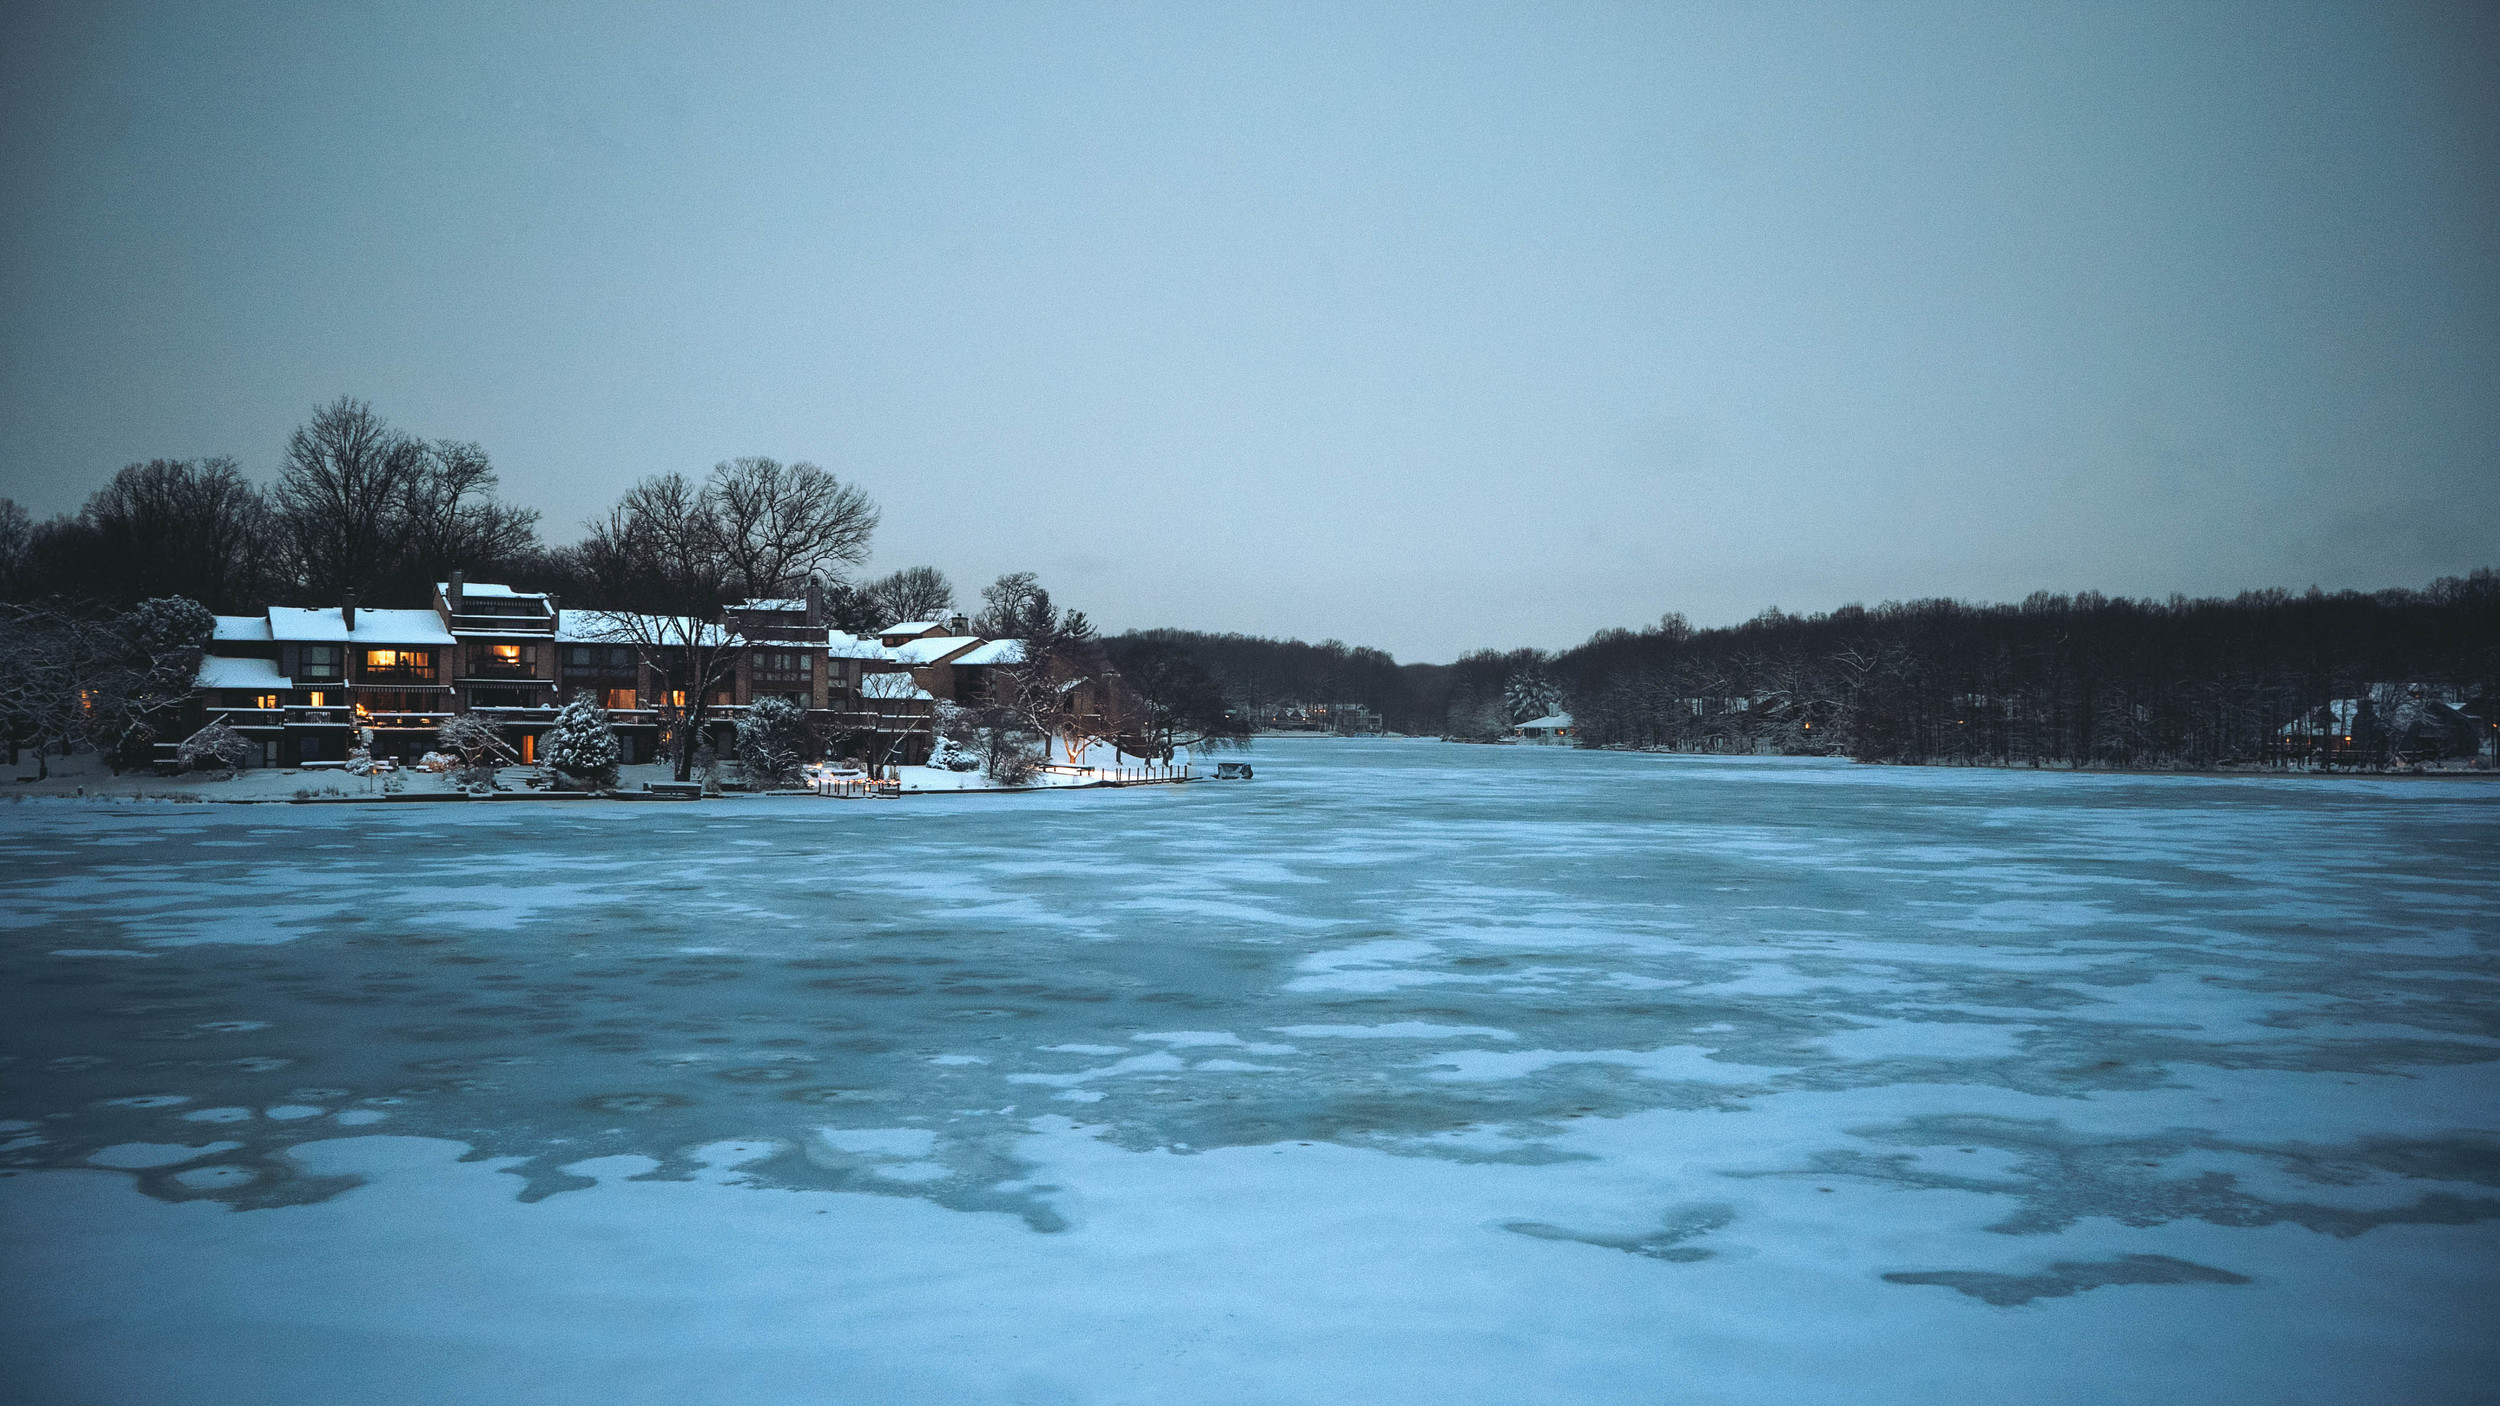 House+by+the+lake.jpg